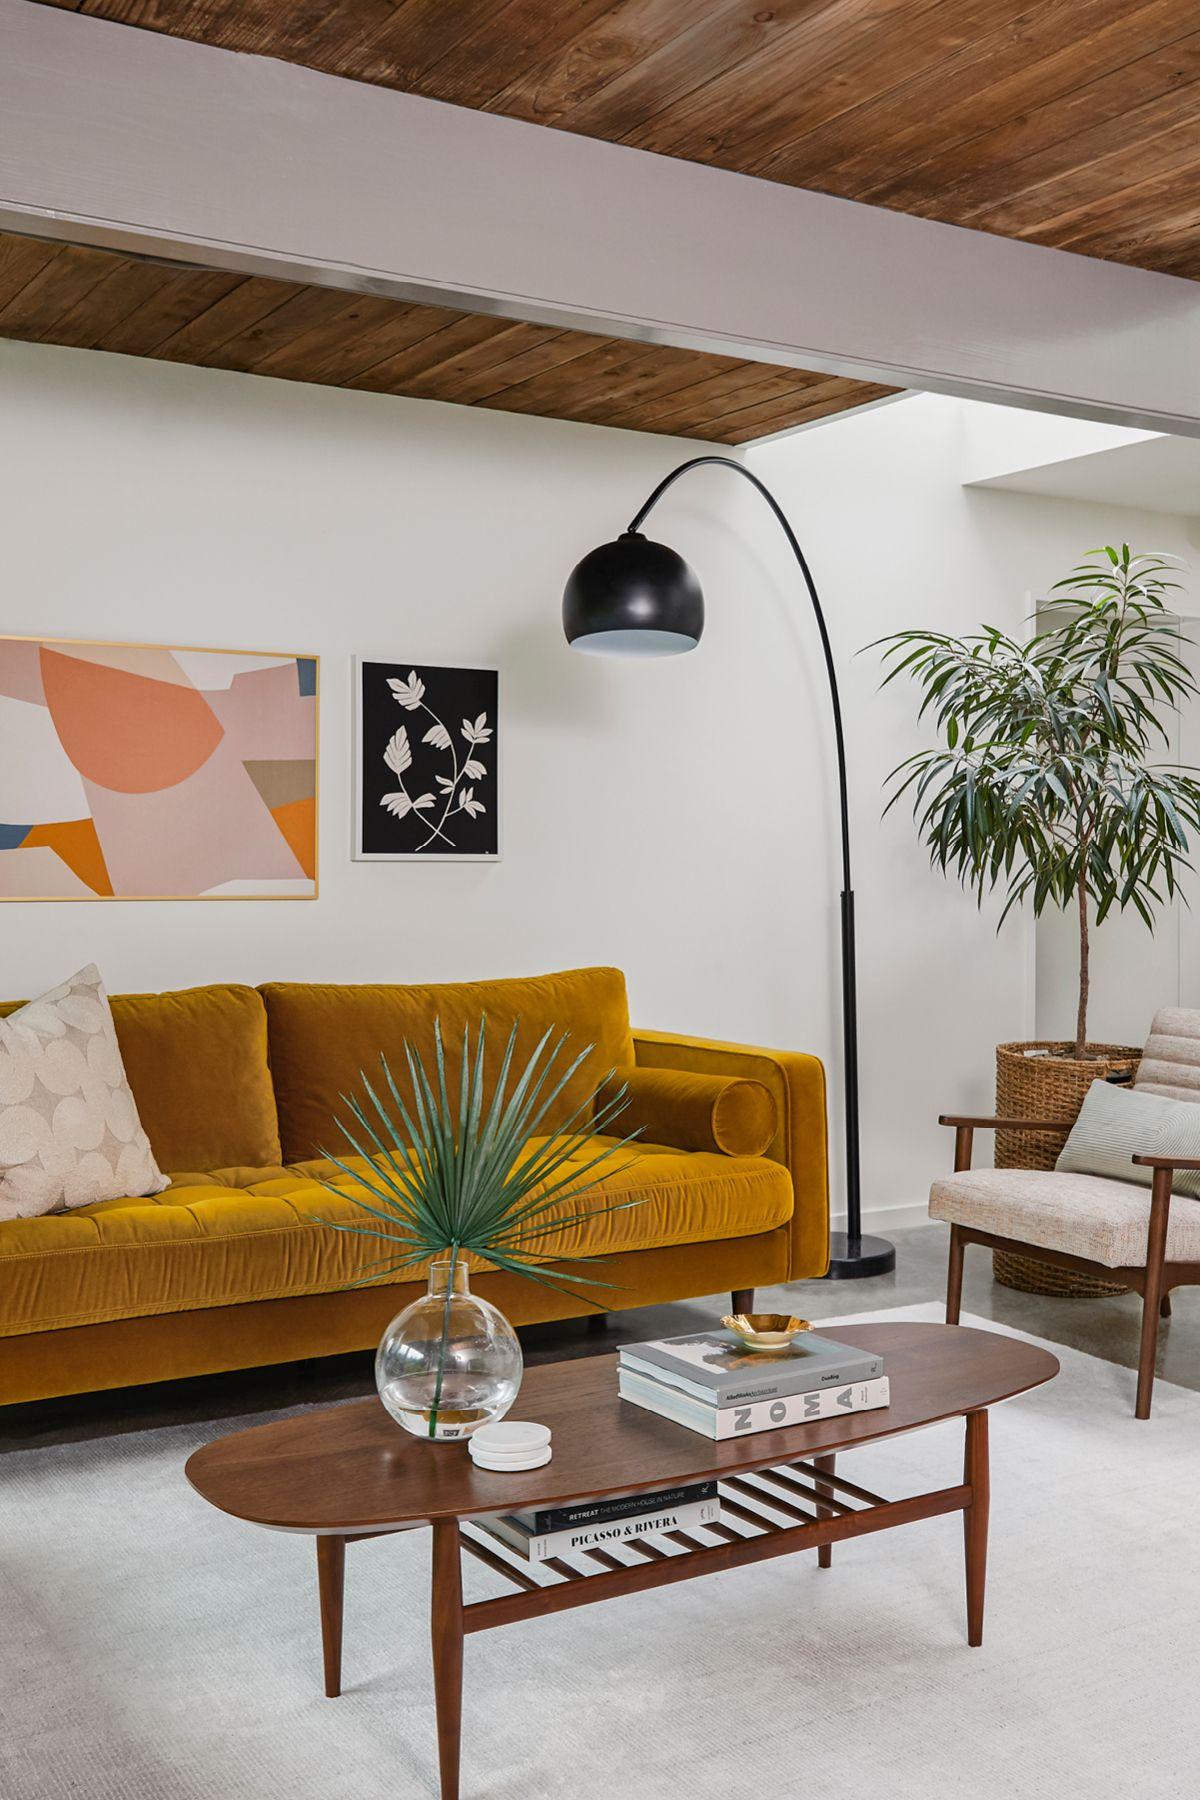 Lenia Walnut Oval Coffee Table Mid Century Modern Living Room Furniture Mid Century Modern Living Room Mid Century Living Room [ 1800 x 1200 Pixel ]